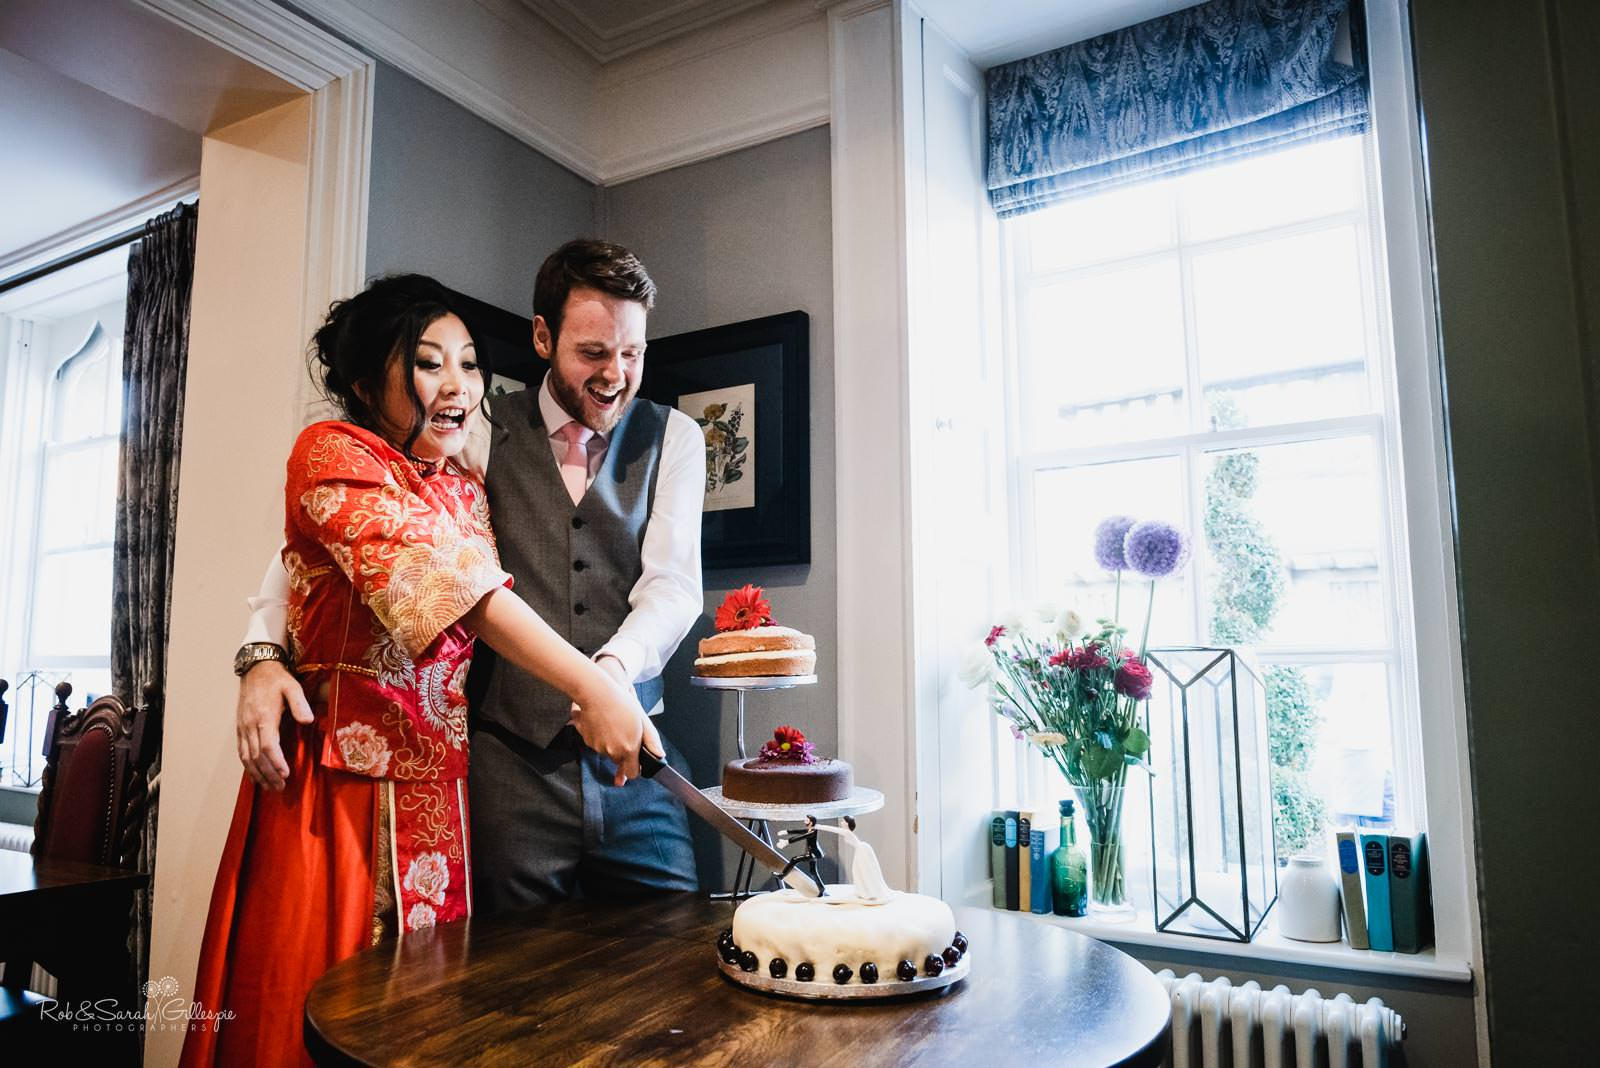 Bride and groom cut cake at Stratford upon Avon wedding